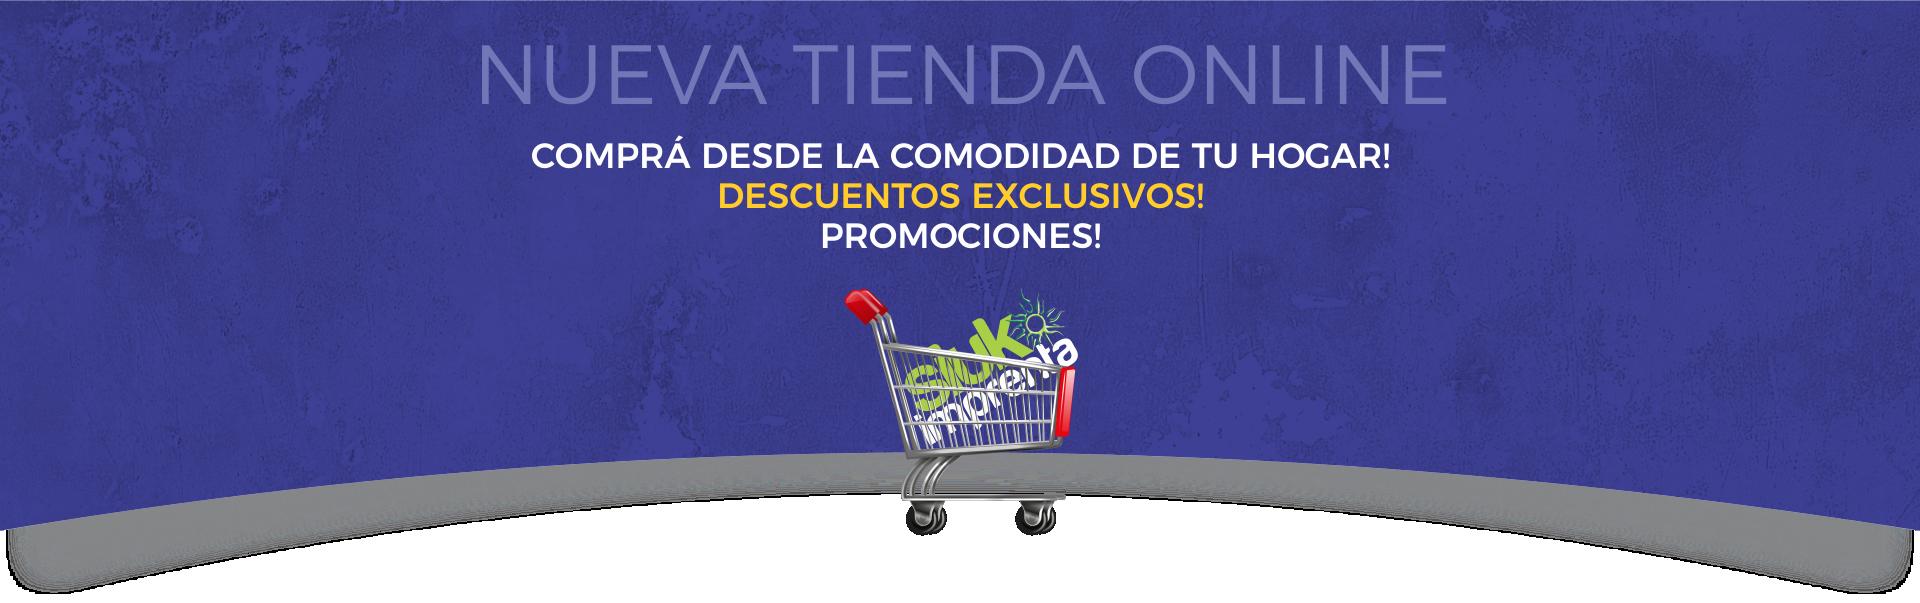 cabezal tienda online